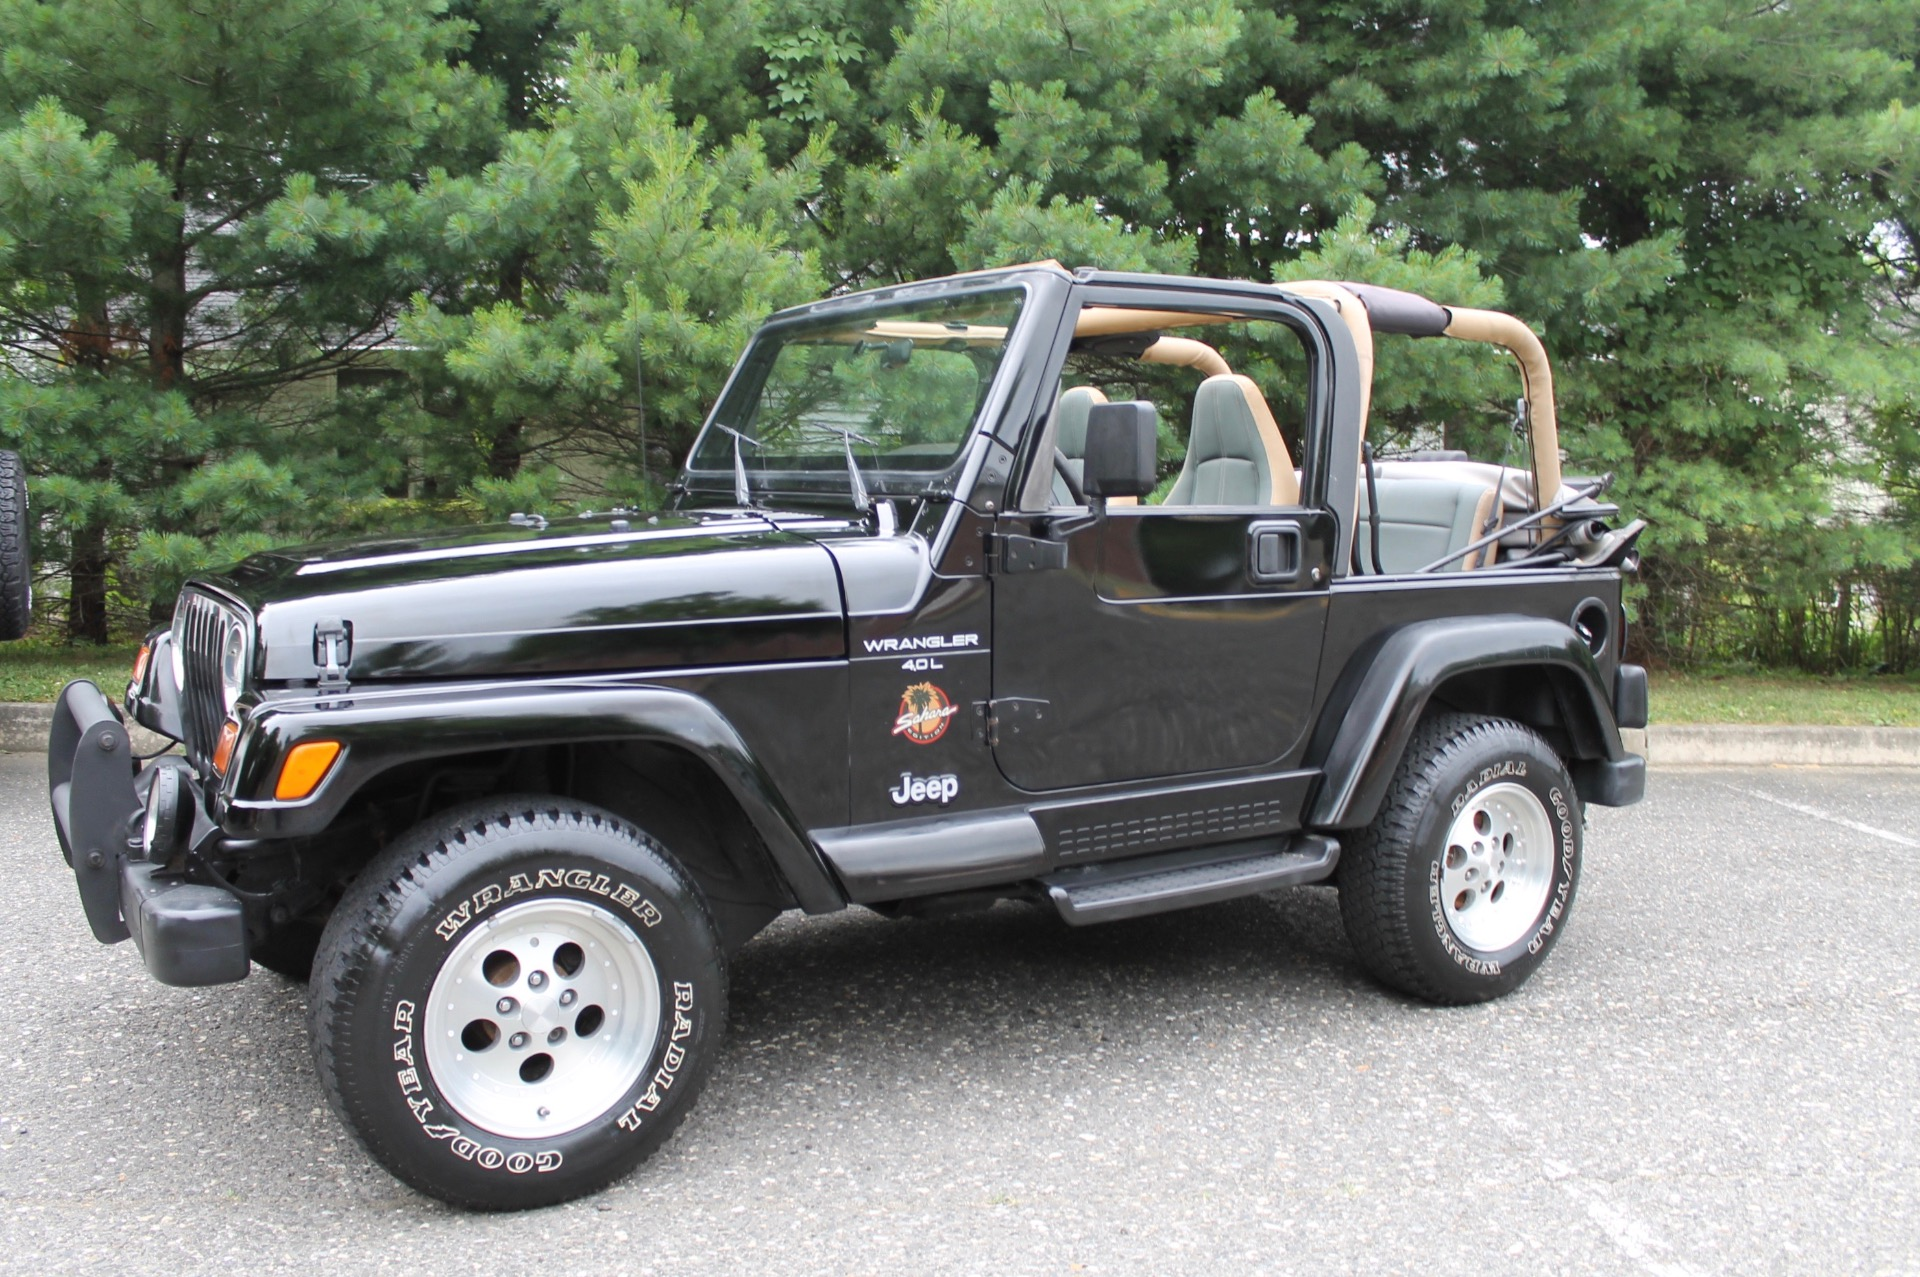 Attractive 1997 Jeep Wrangler Sahara